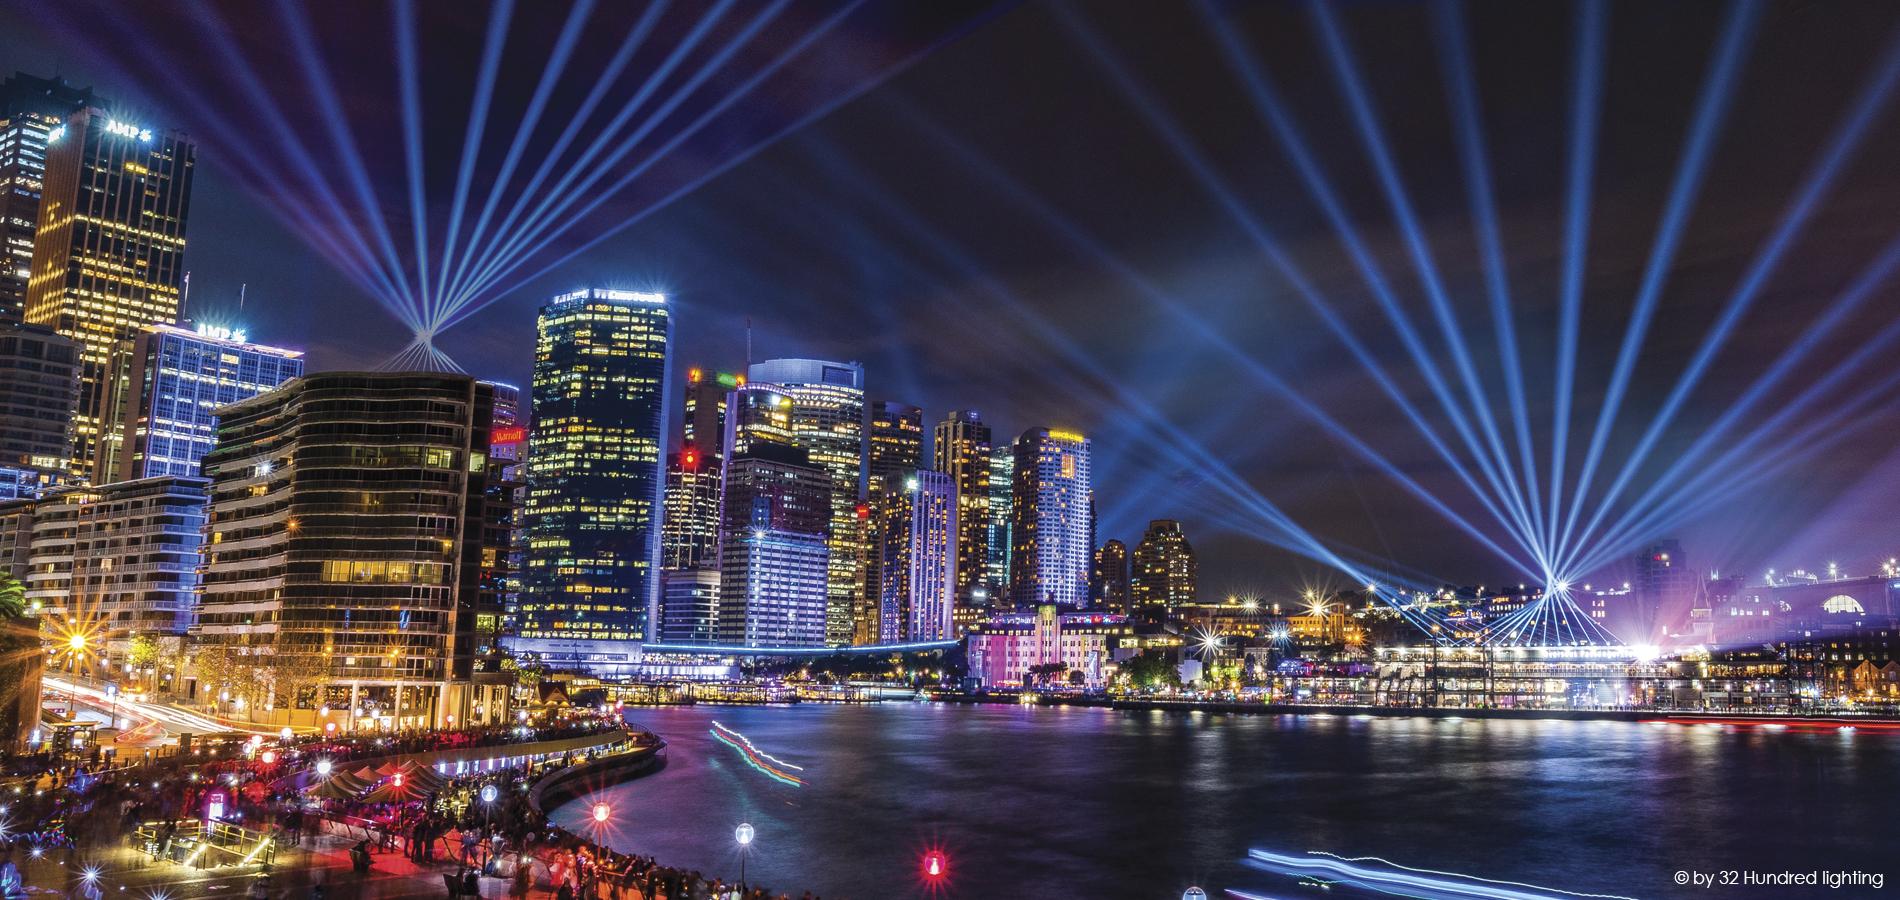 Light show over Sydney Harbour and Bridge